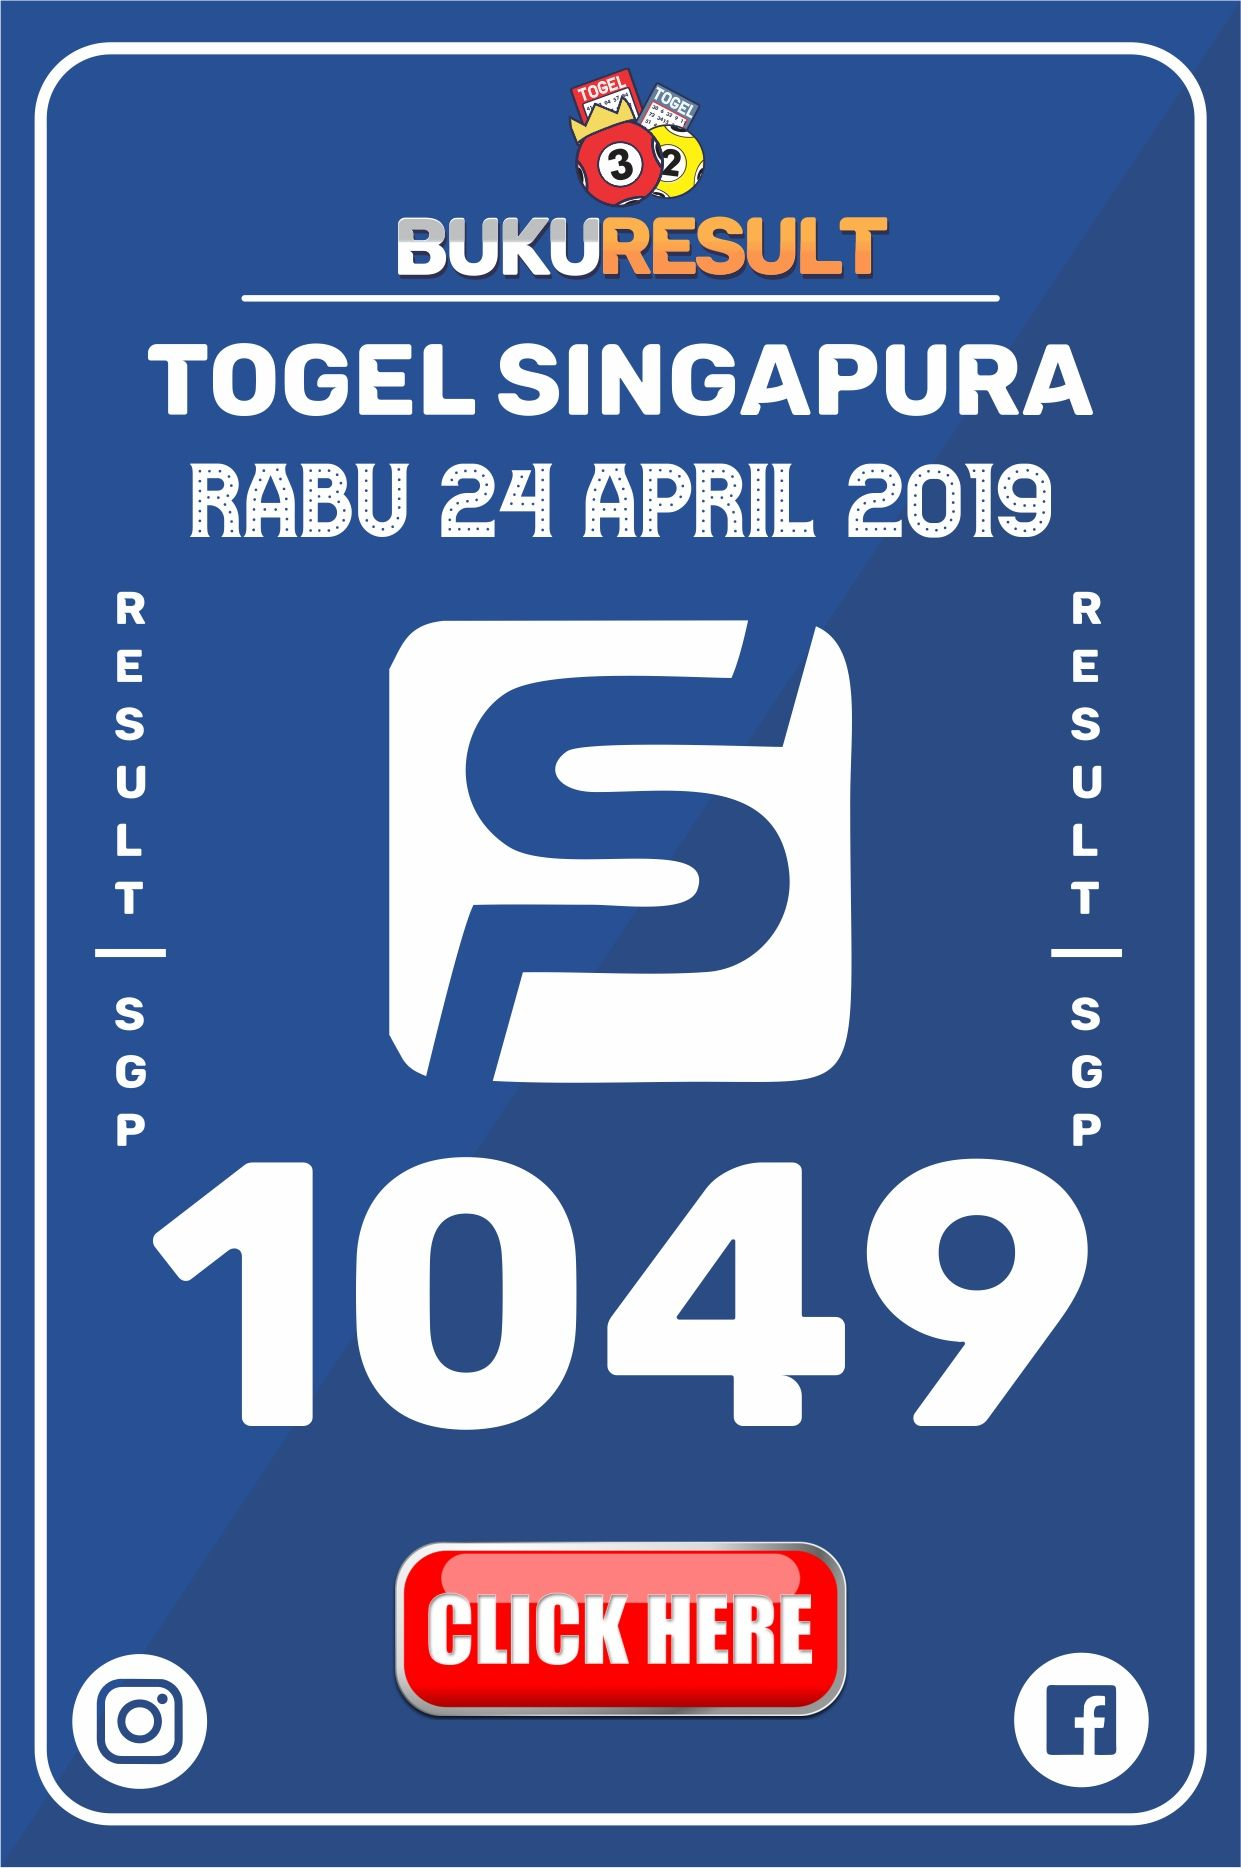 Togel Singapore Hari Ini 2019 : togel, singapore, Keluaran, Togel, Singapura, Result